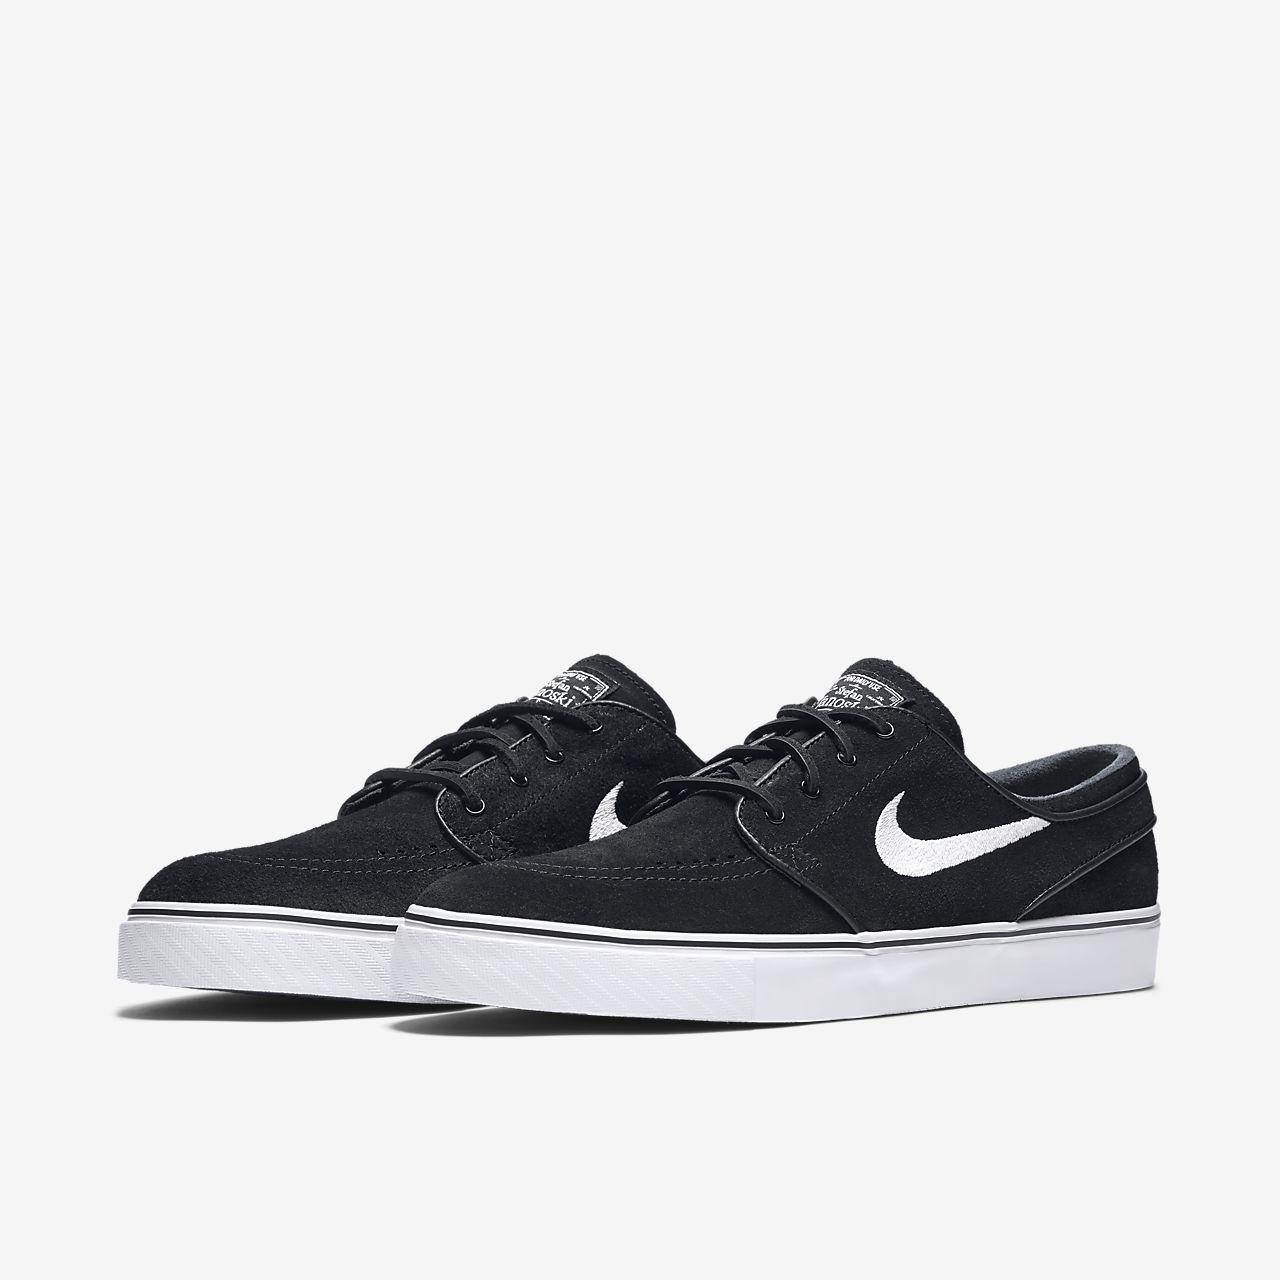 5cd09317fd0f Nike SB Zoom Stefan Janoski OG Herren-Skateboardschuh. Nike.com AT